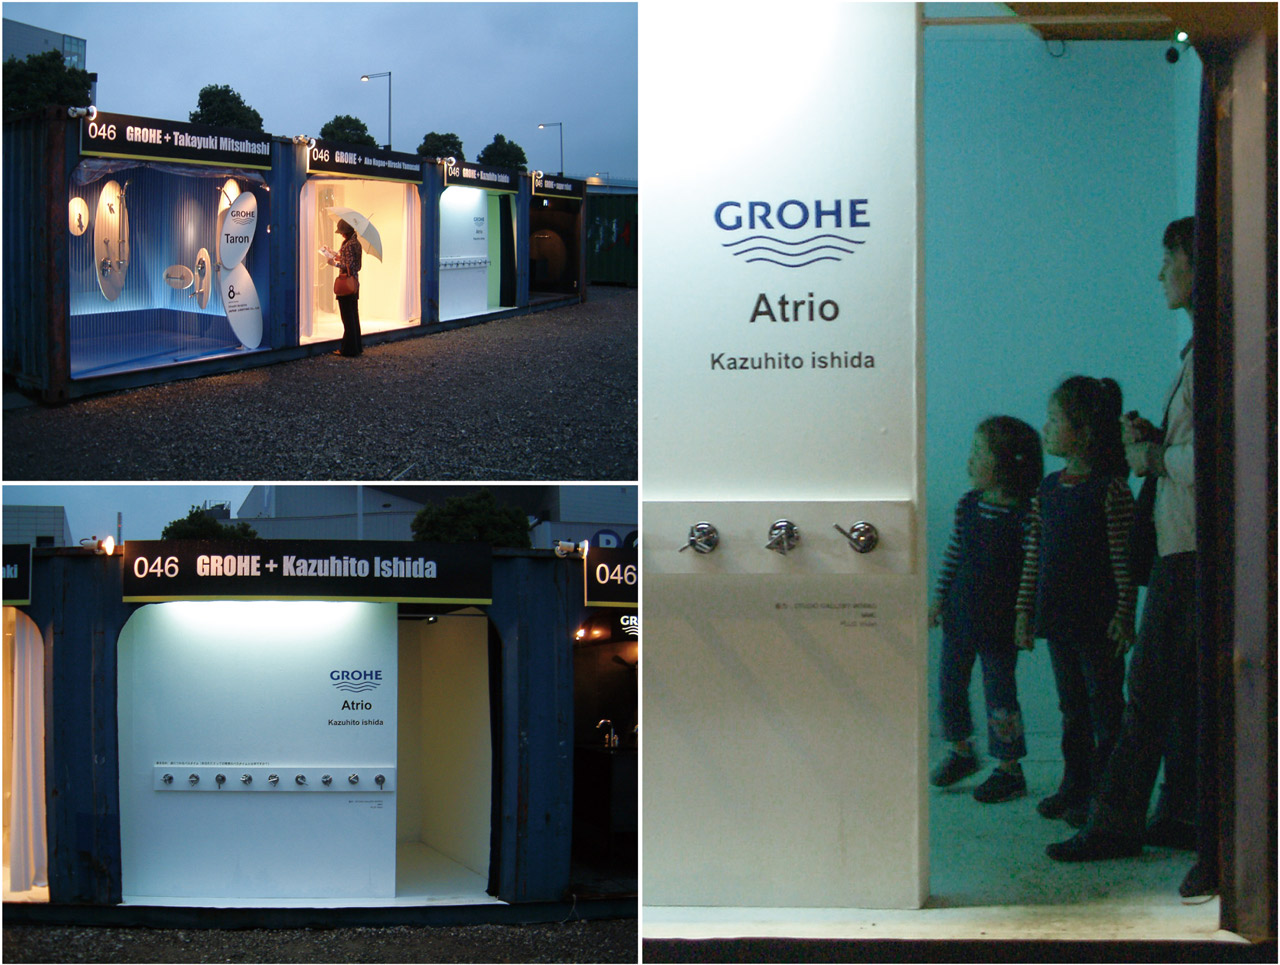 GROHE_S3.jpg